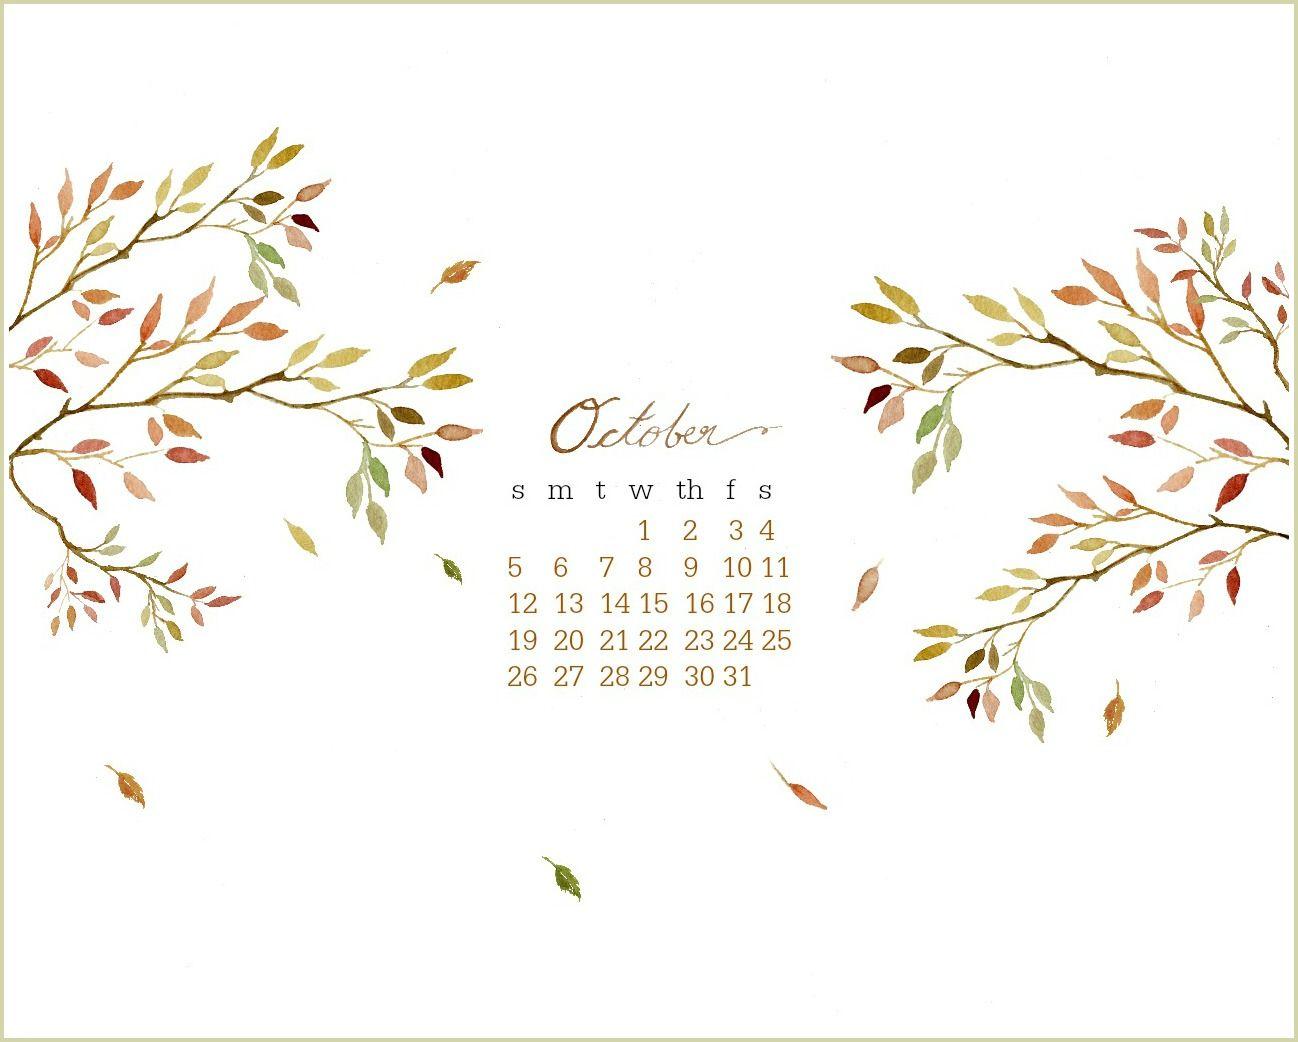 October Free Desktop Watercolor Calendar Hintergrund Kalender